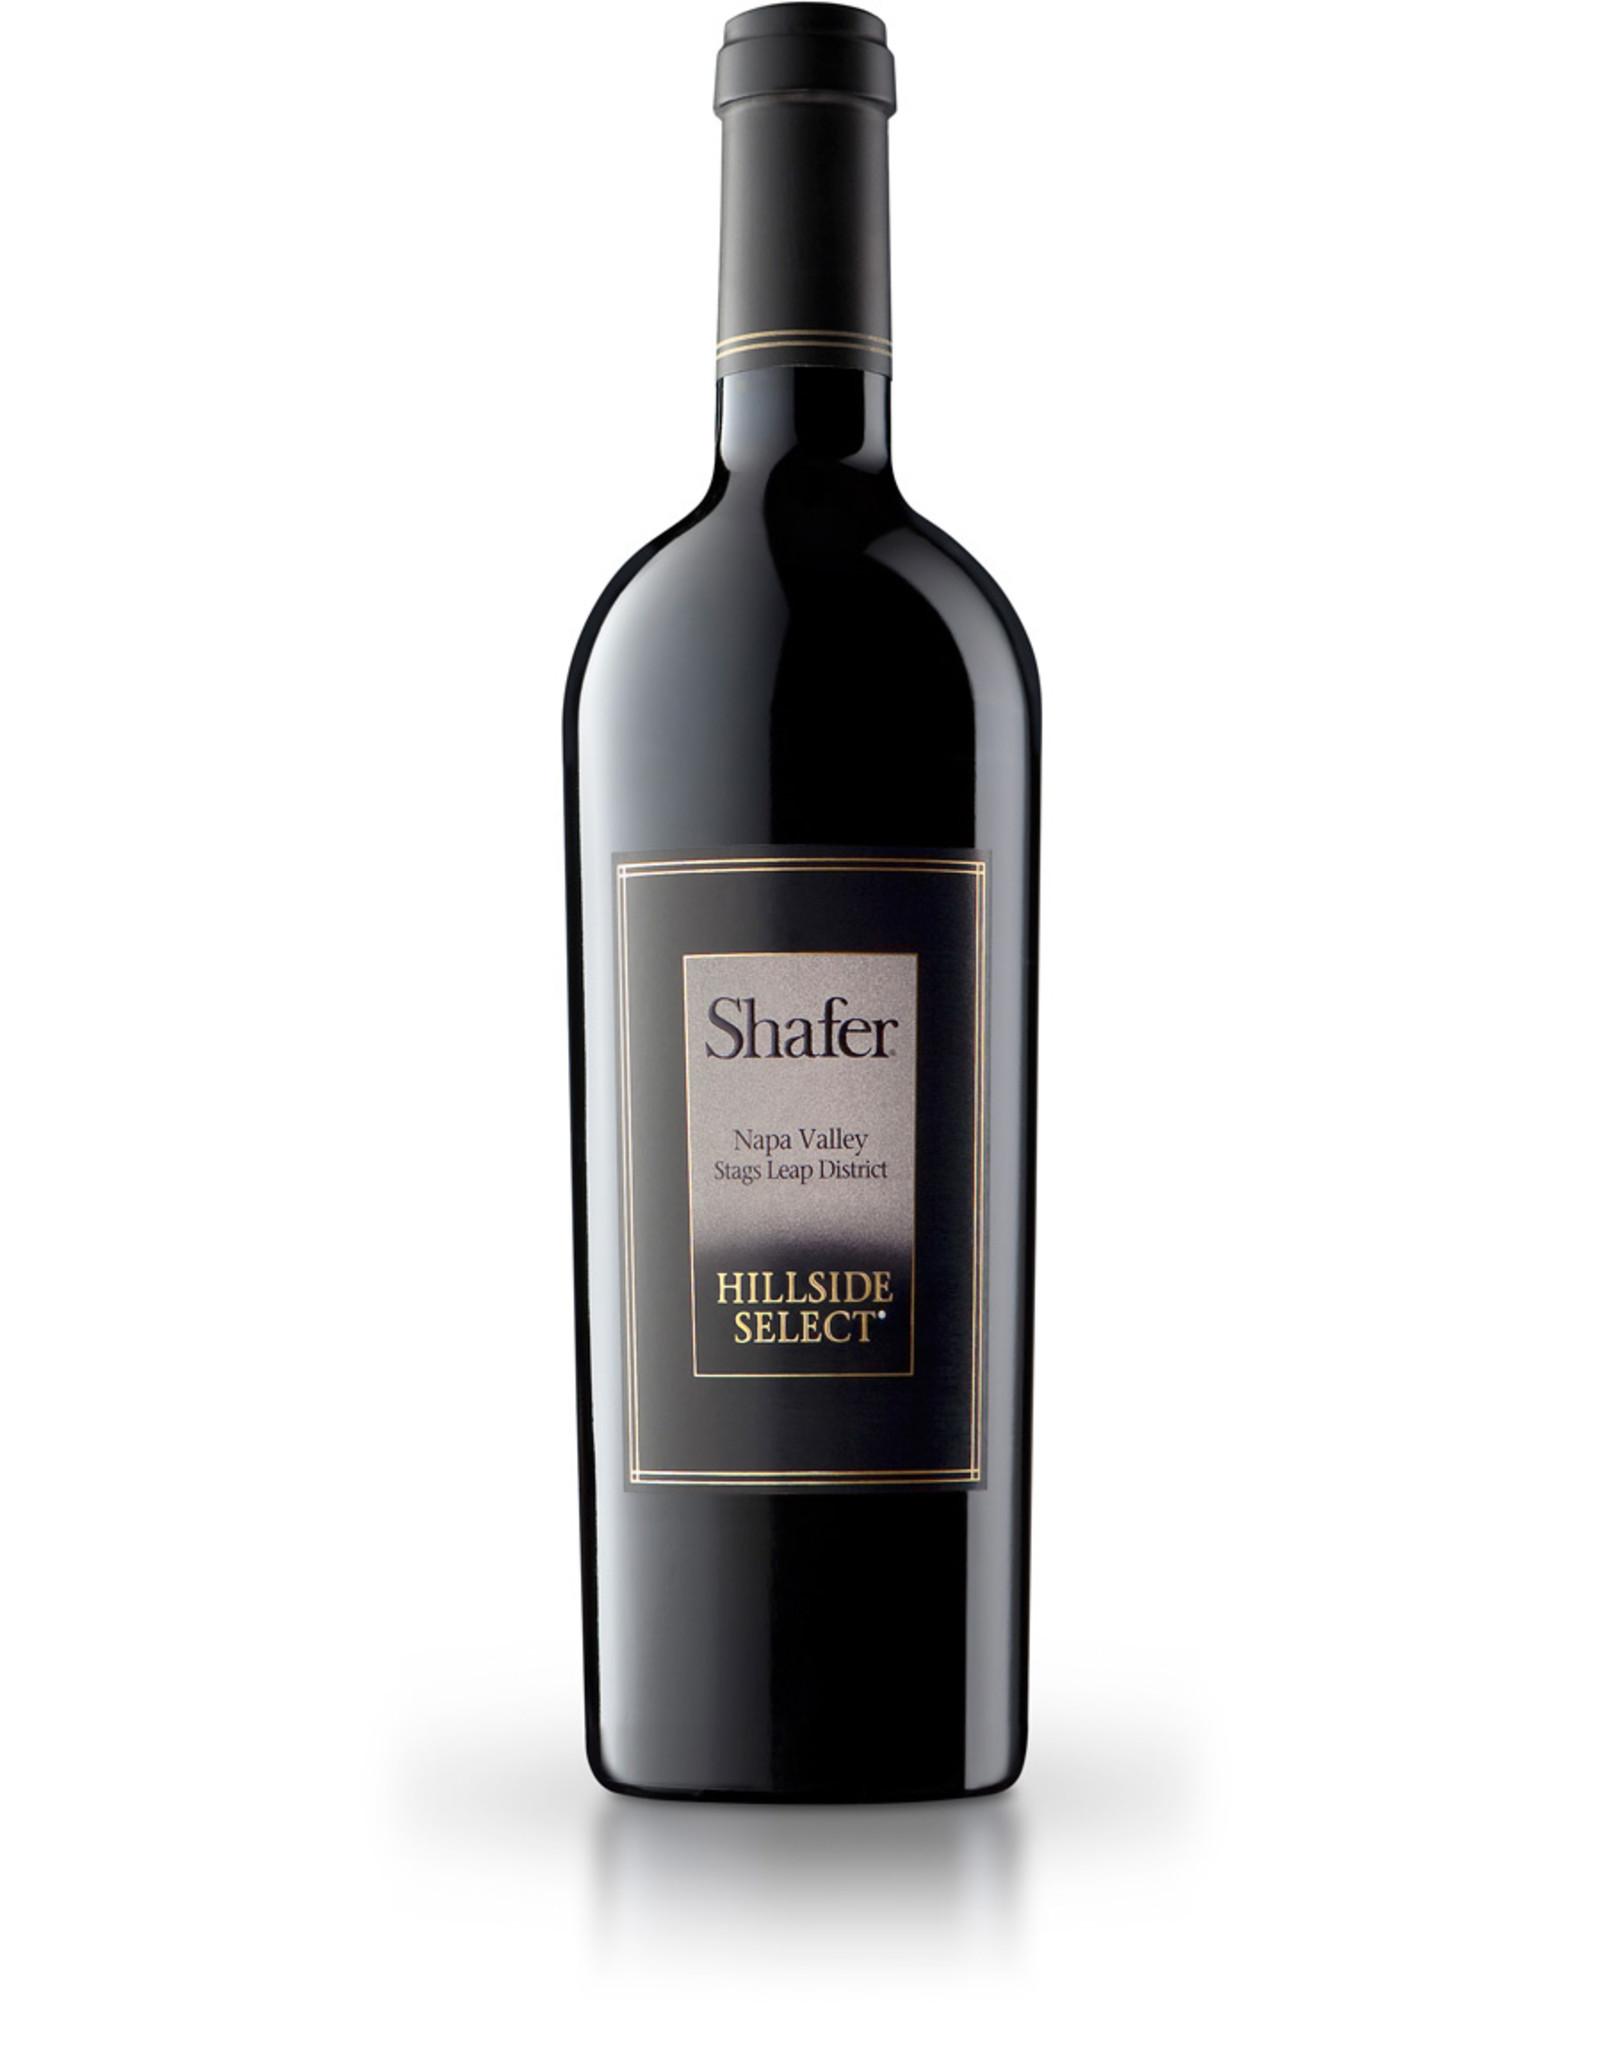 Shafer Hillside Select Cabernet Sauvignon